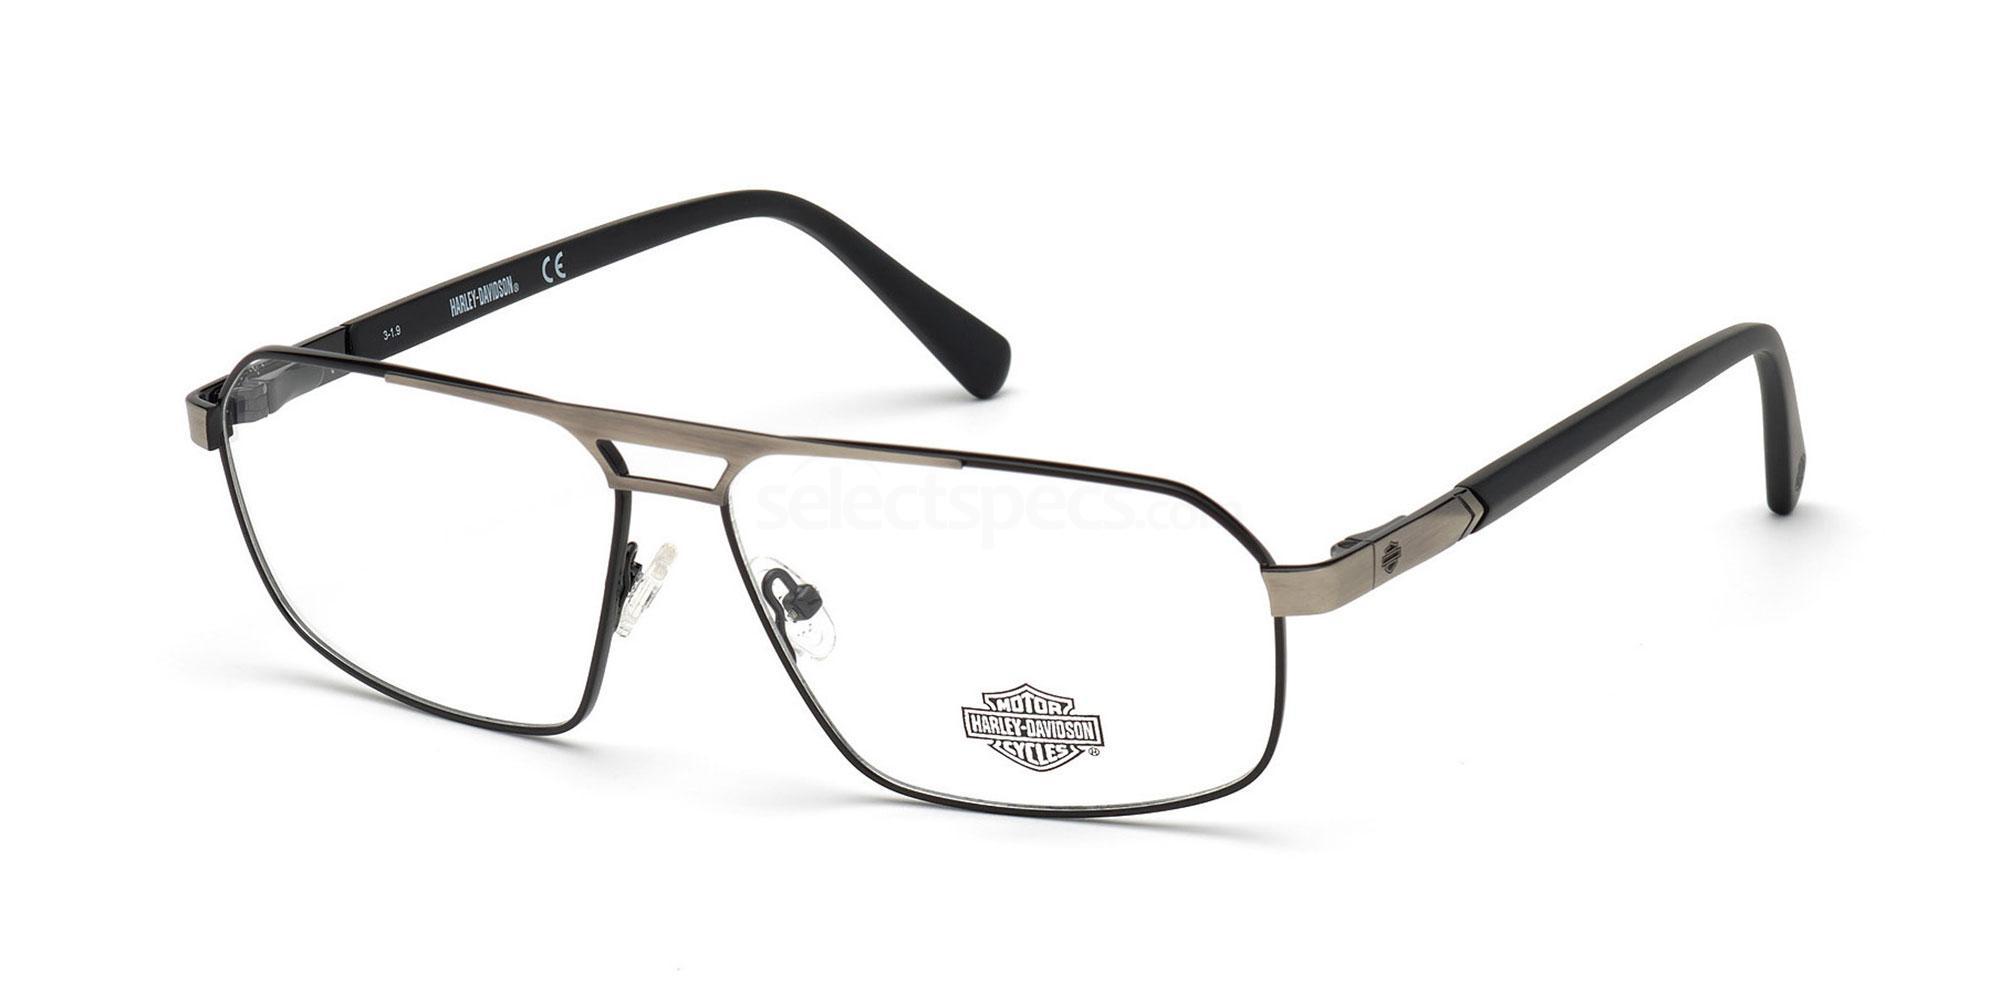 001 HD0809 Glasses, Harley Davidson